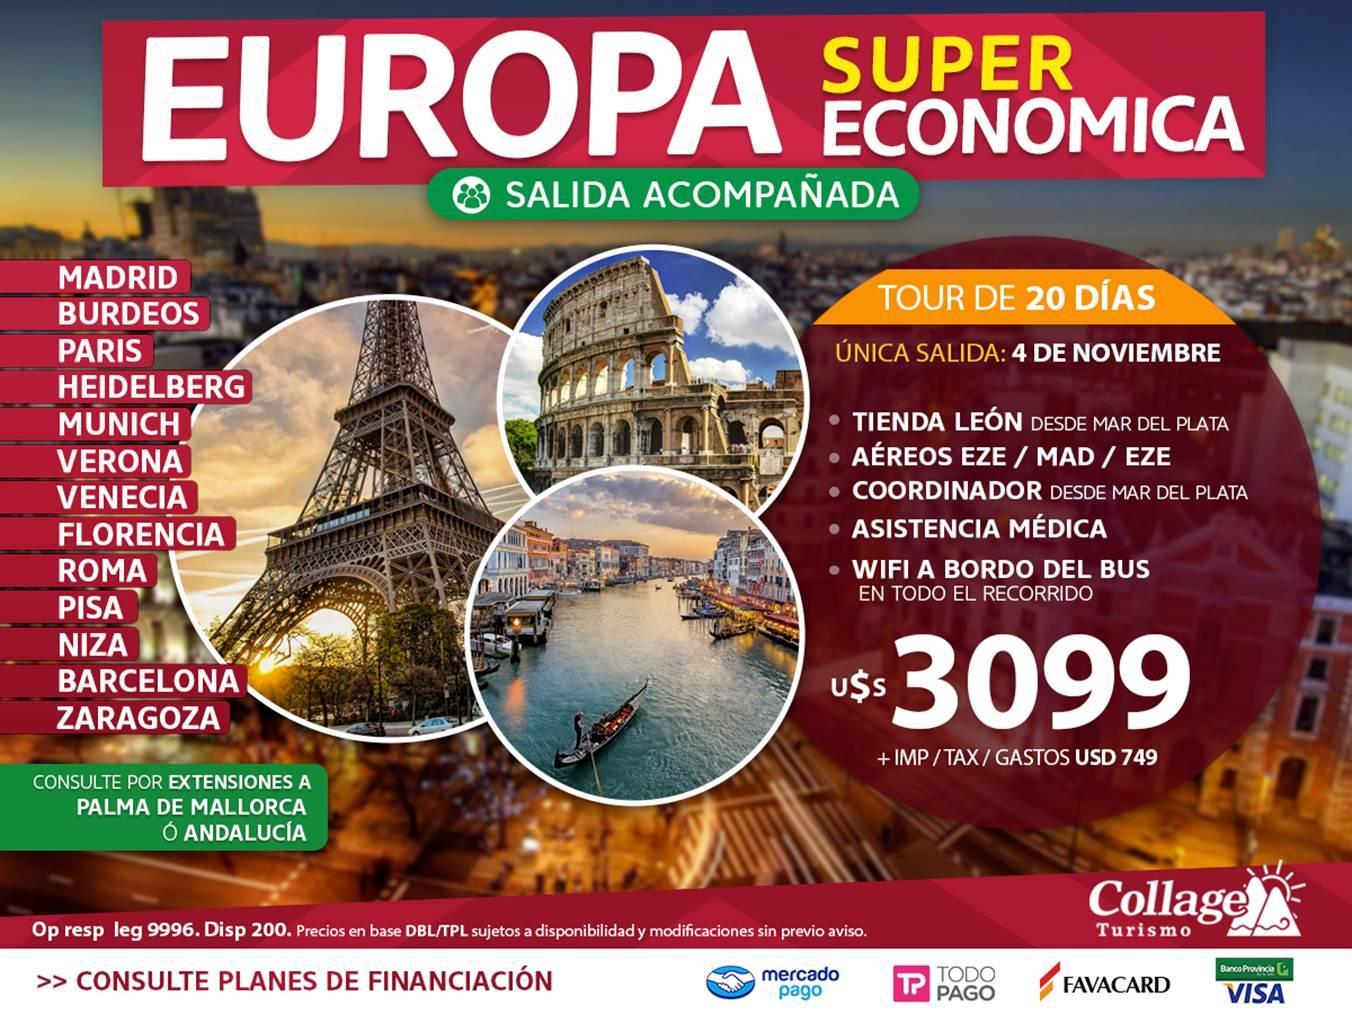 EUROPA ECONOMICA EN GRUPO DESDE MDQ